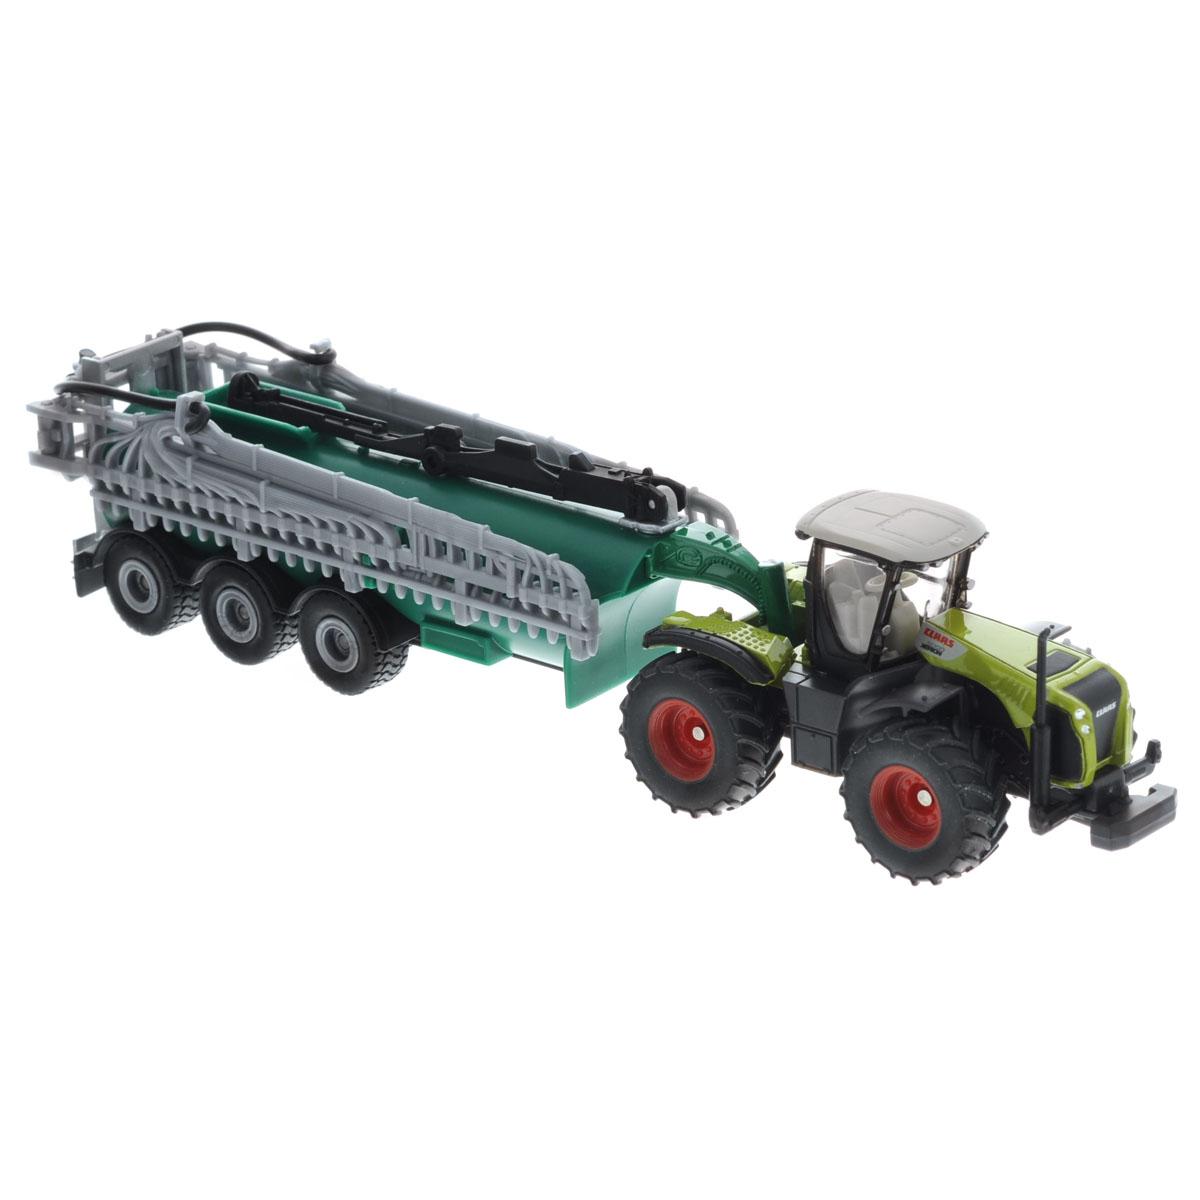 Siku Трактор Claas Xerion с вакуумным баком Samson siku трактор claas xerion 5000